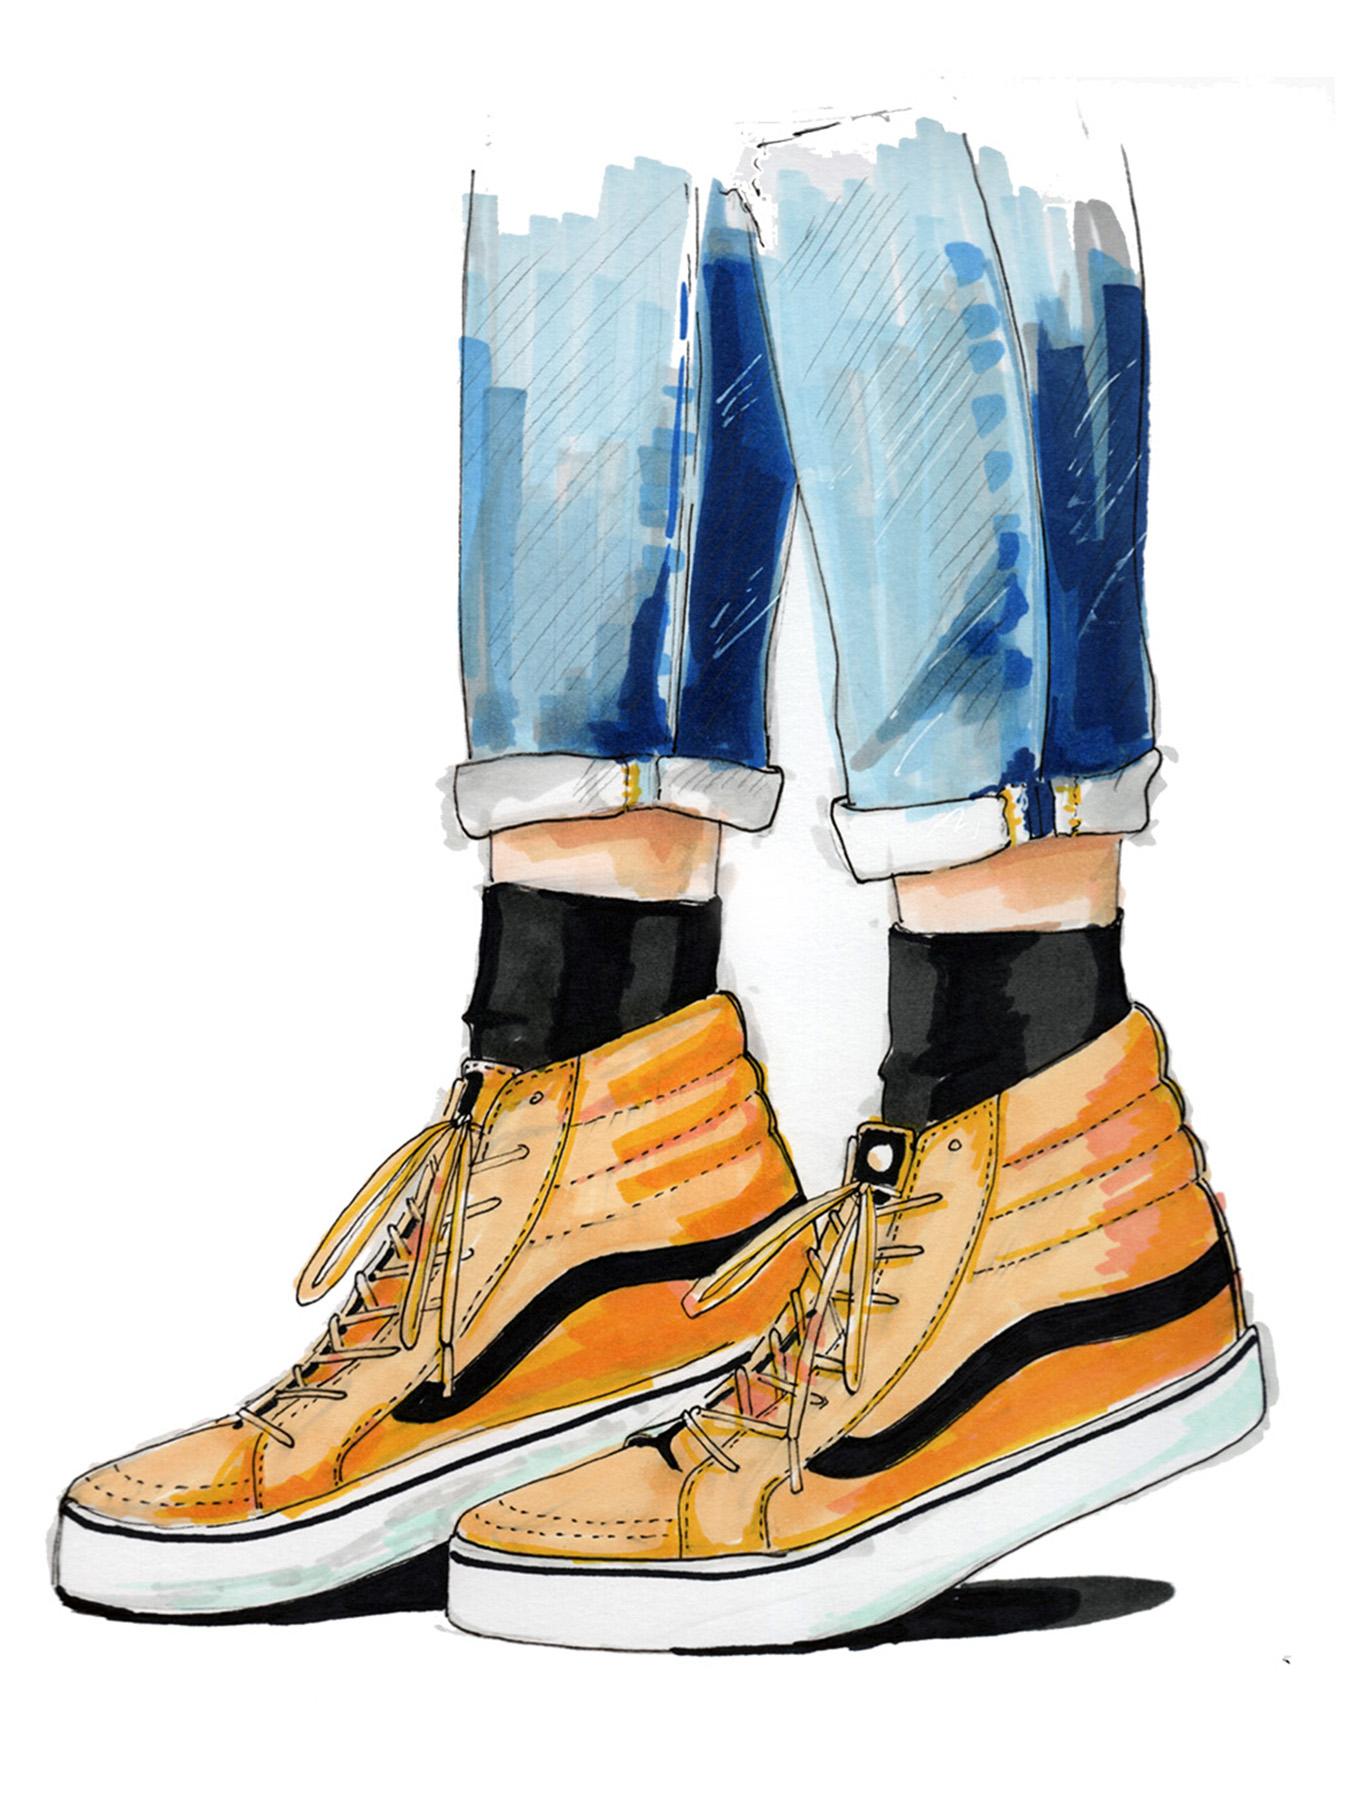 vans-shoes-illustration-morgan-swank-studio.jpg